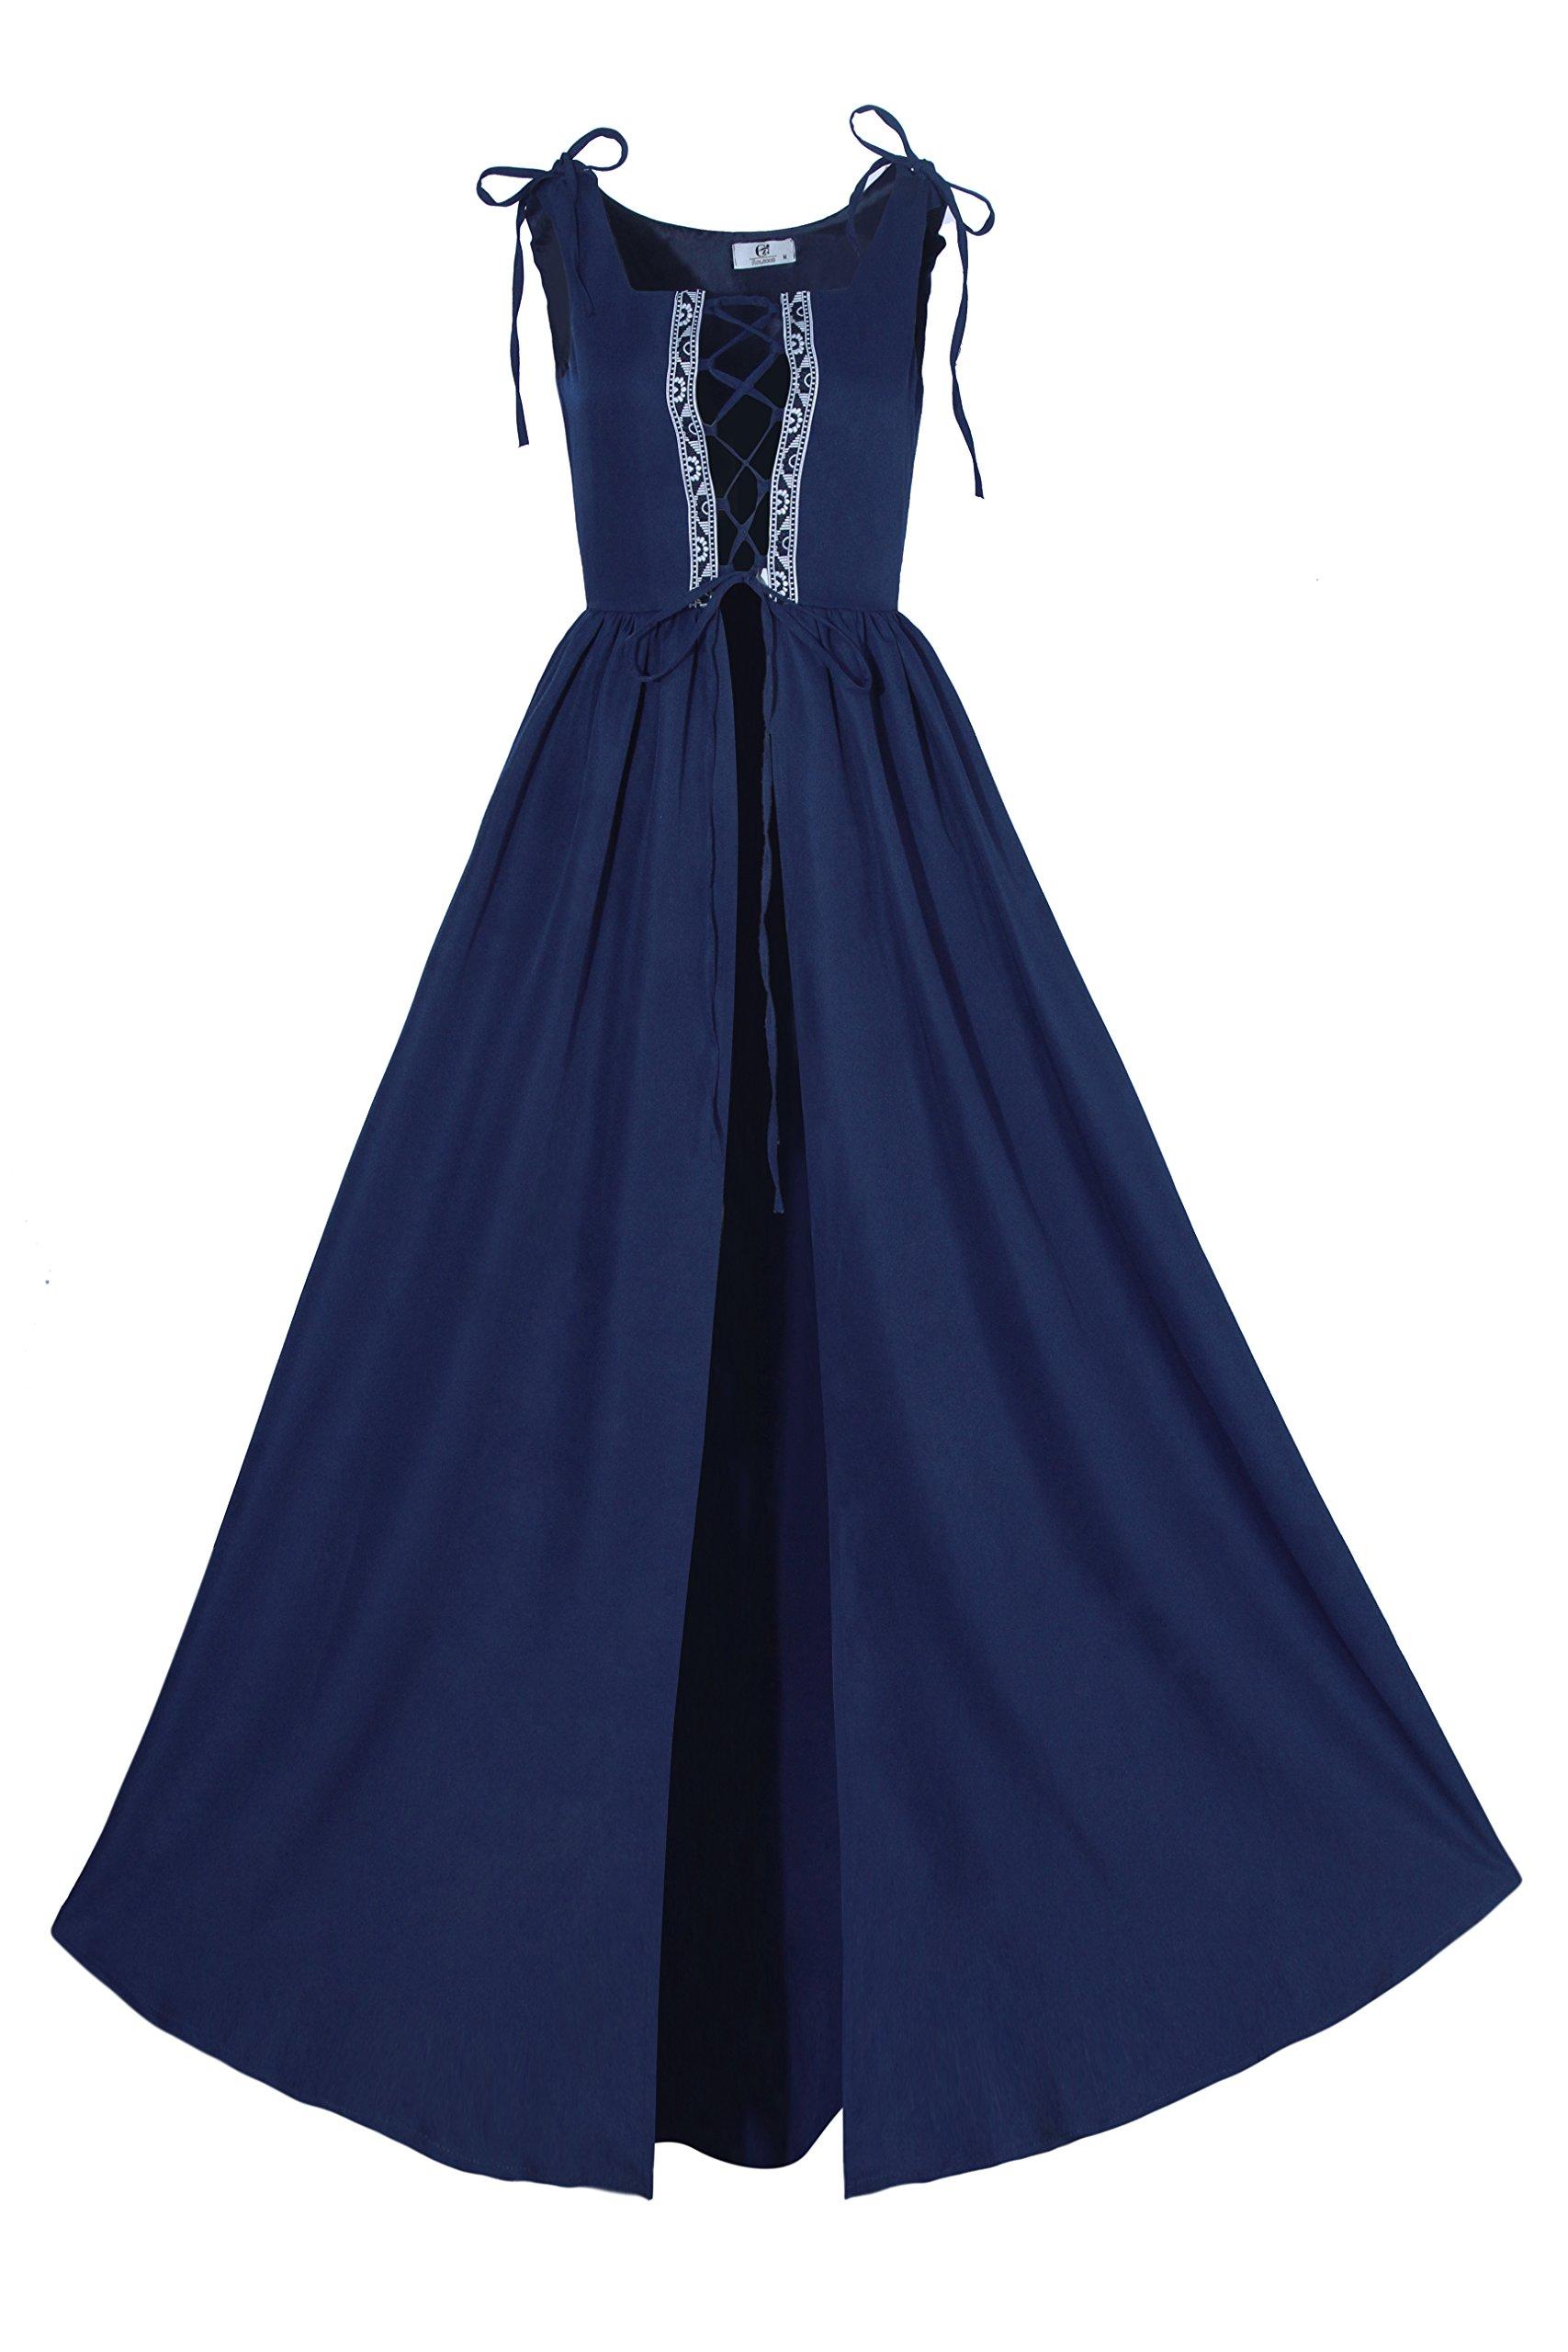 Lemail Womens Renaissance Irish Overdress Medieval Pirate Peasant Costume Coat Navy Blue L